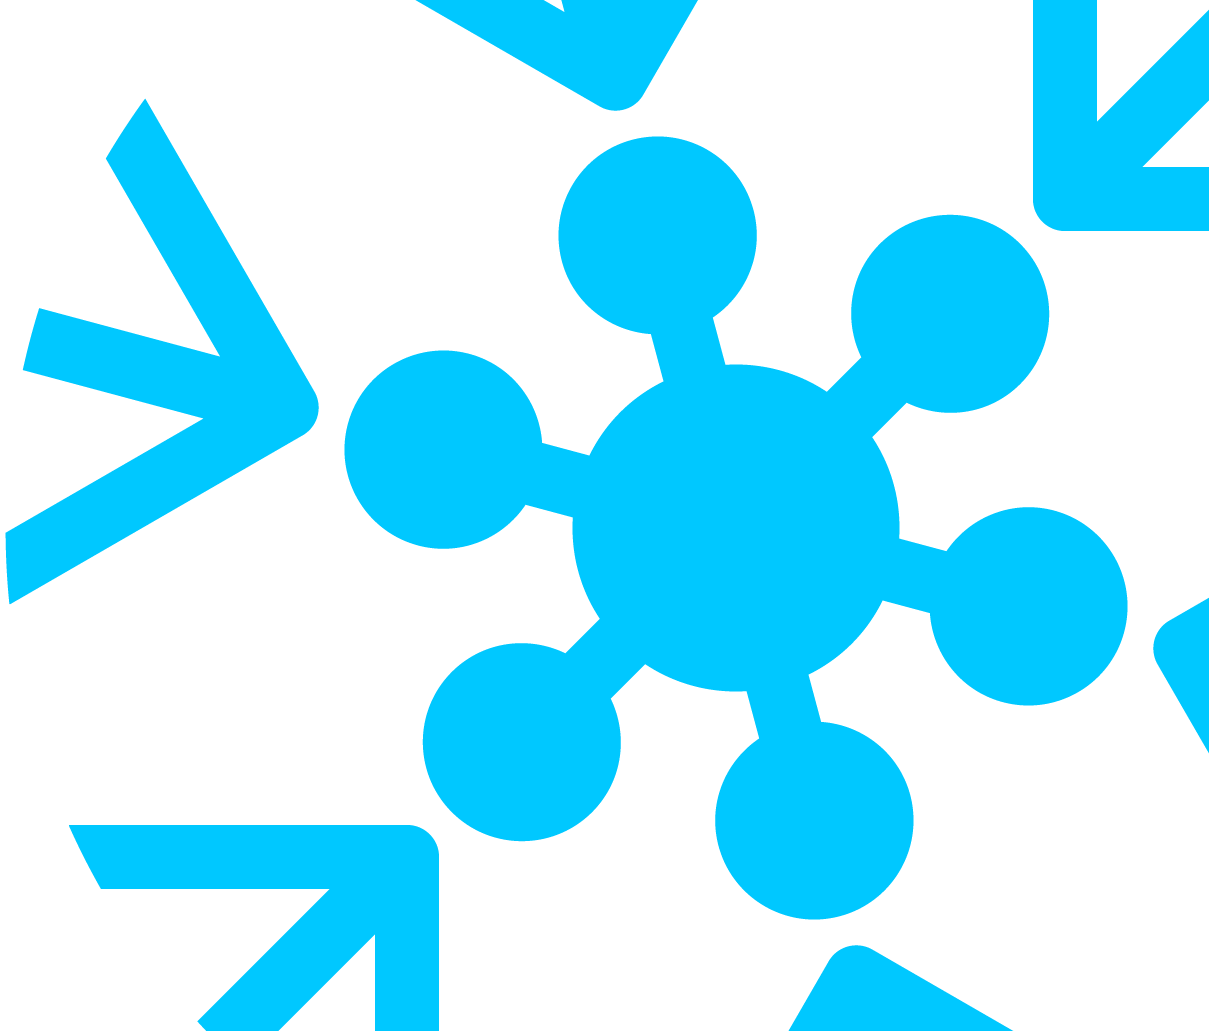 logo_blue_whitebackground-1-1